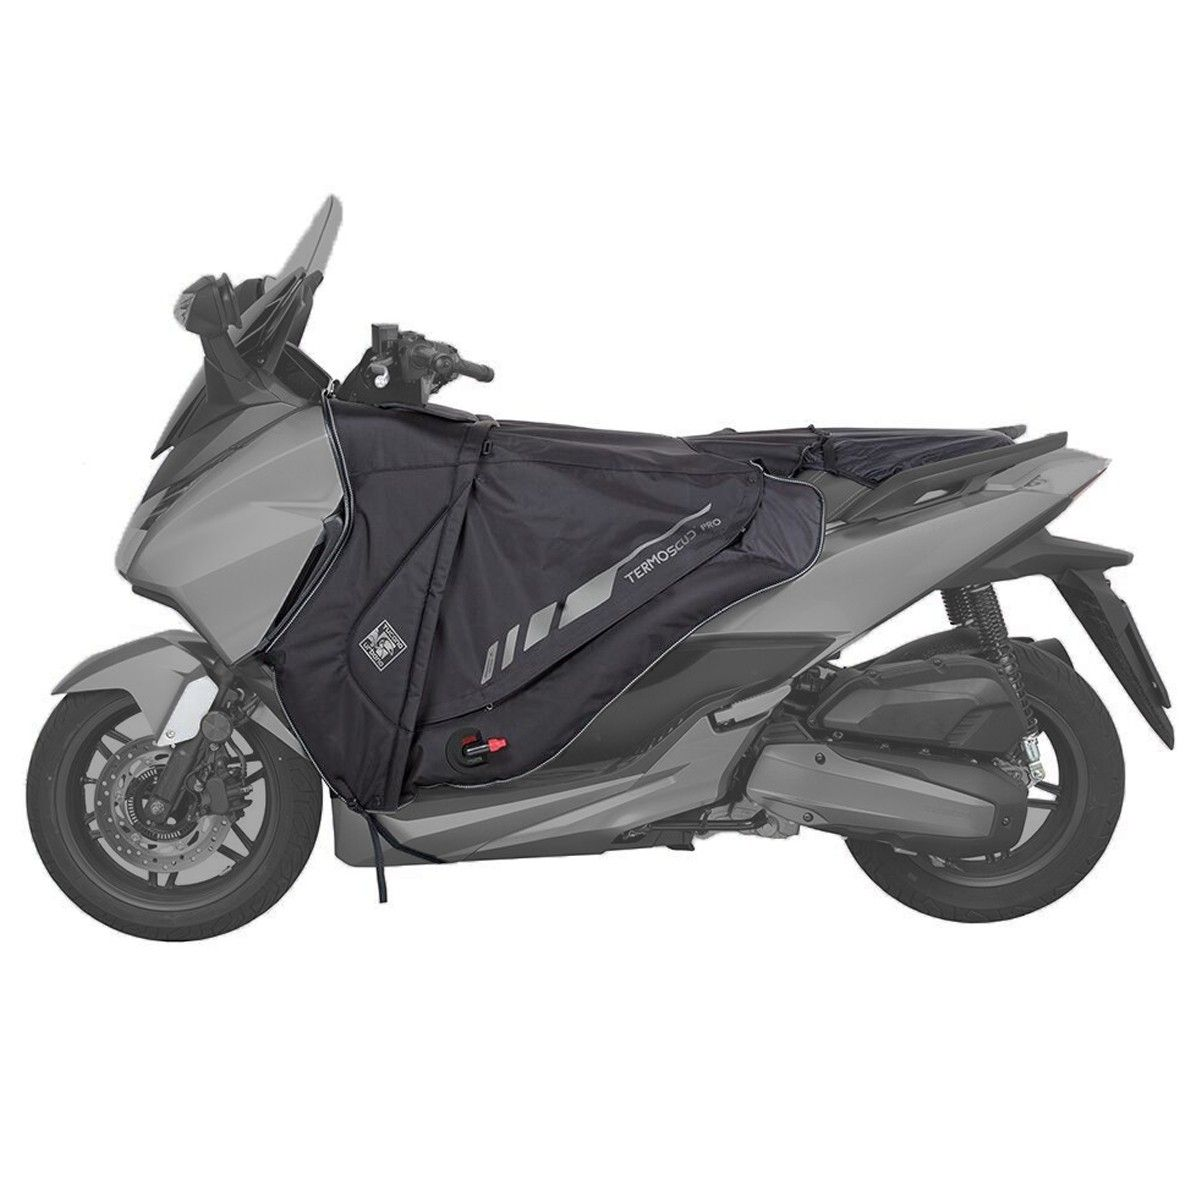 Tucano Urbano Yamaha T-Max 530 Diz Örtüsü Termoscud® Pro (R189Pro)